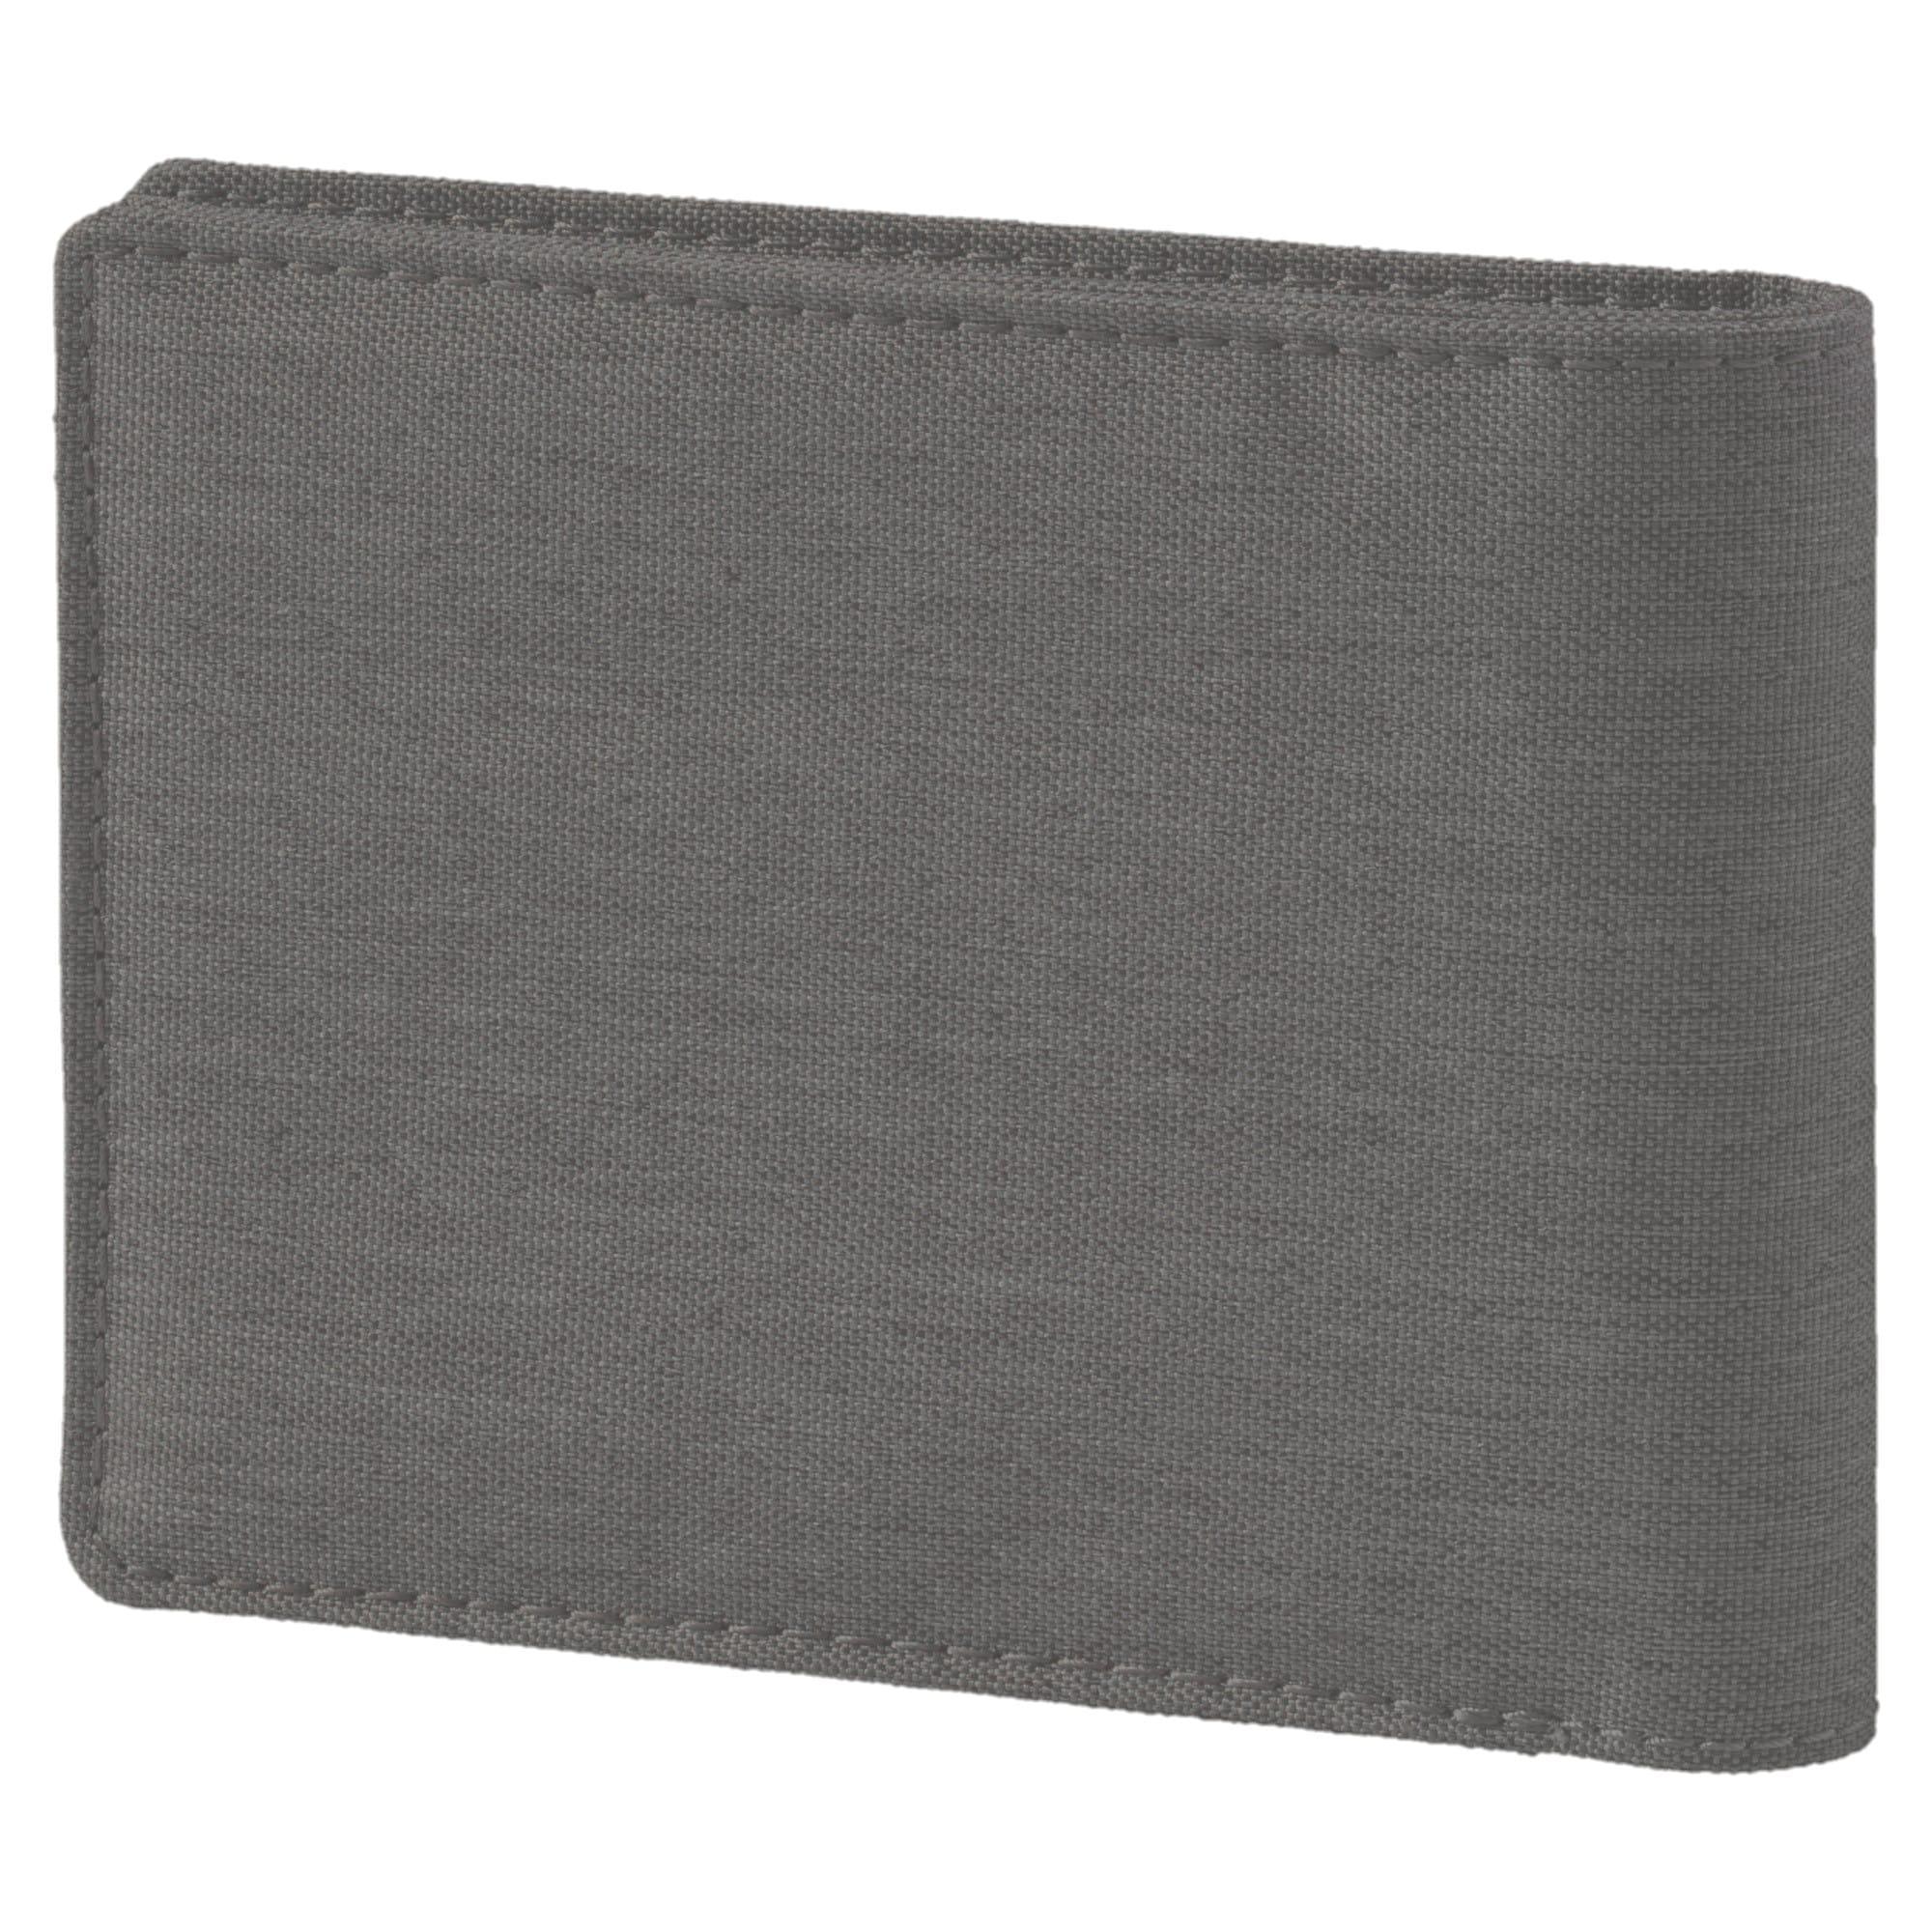 Thumbnail 2 of Ferrari Lifestyle Wallet, Charcoal Gray, medium-IND